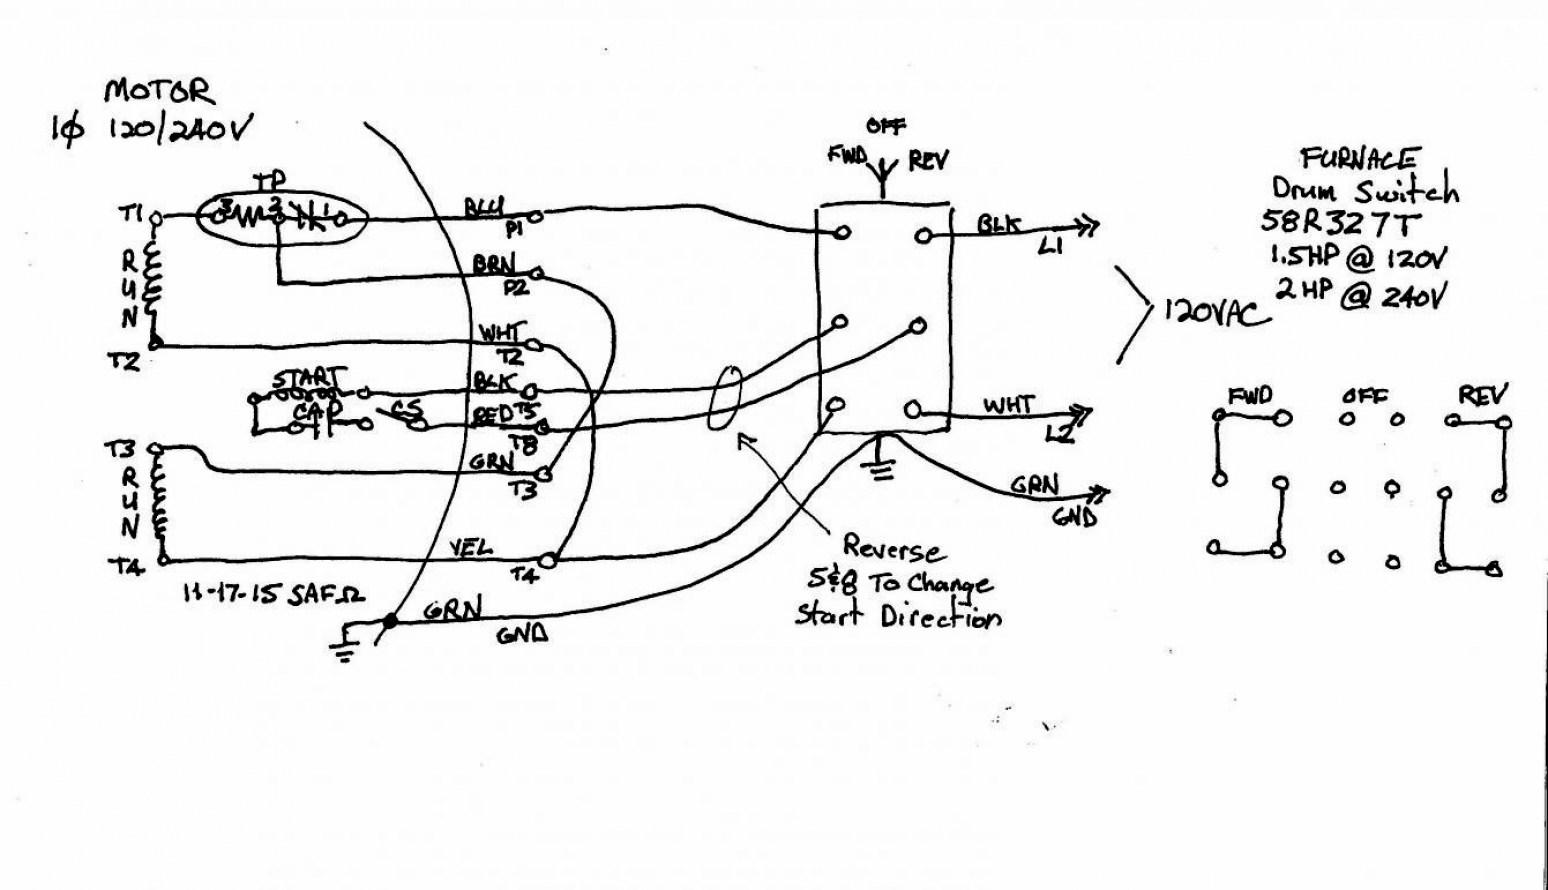 [DIAGRAM_0HG]  XH_1265] Drum Switch Wiring Diagram Also Motor Repalcement Parts And Diagram | Bremas Boat Lift Switch Wiring Diagram |  | Numdin Redne Romet Apom Simij Knie Rdona Benol Eatte Mohammedshrine Librar  Wiring 101